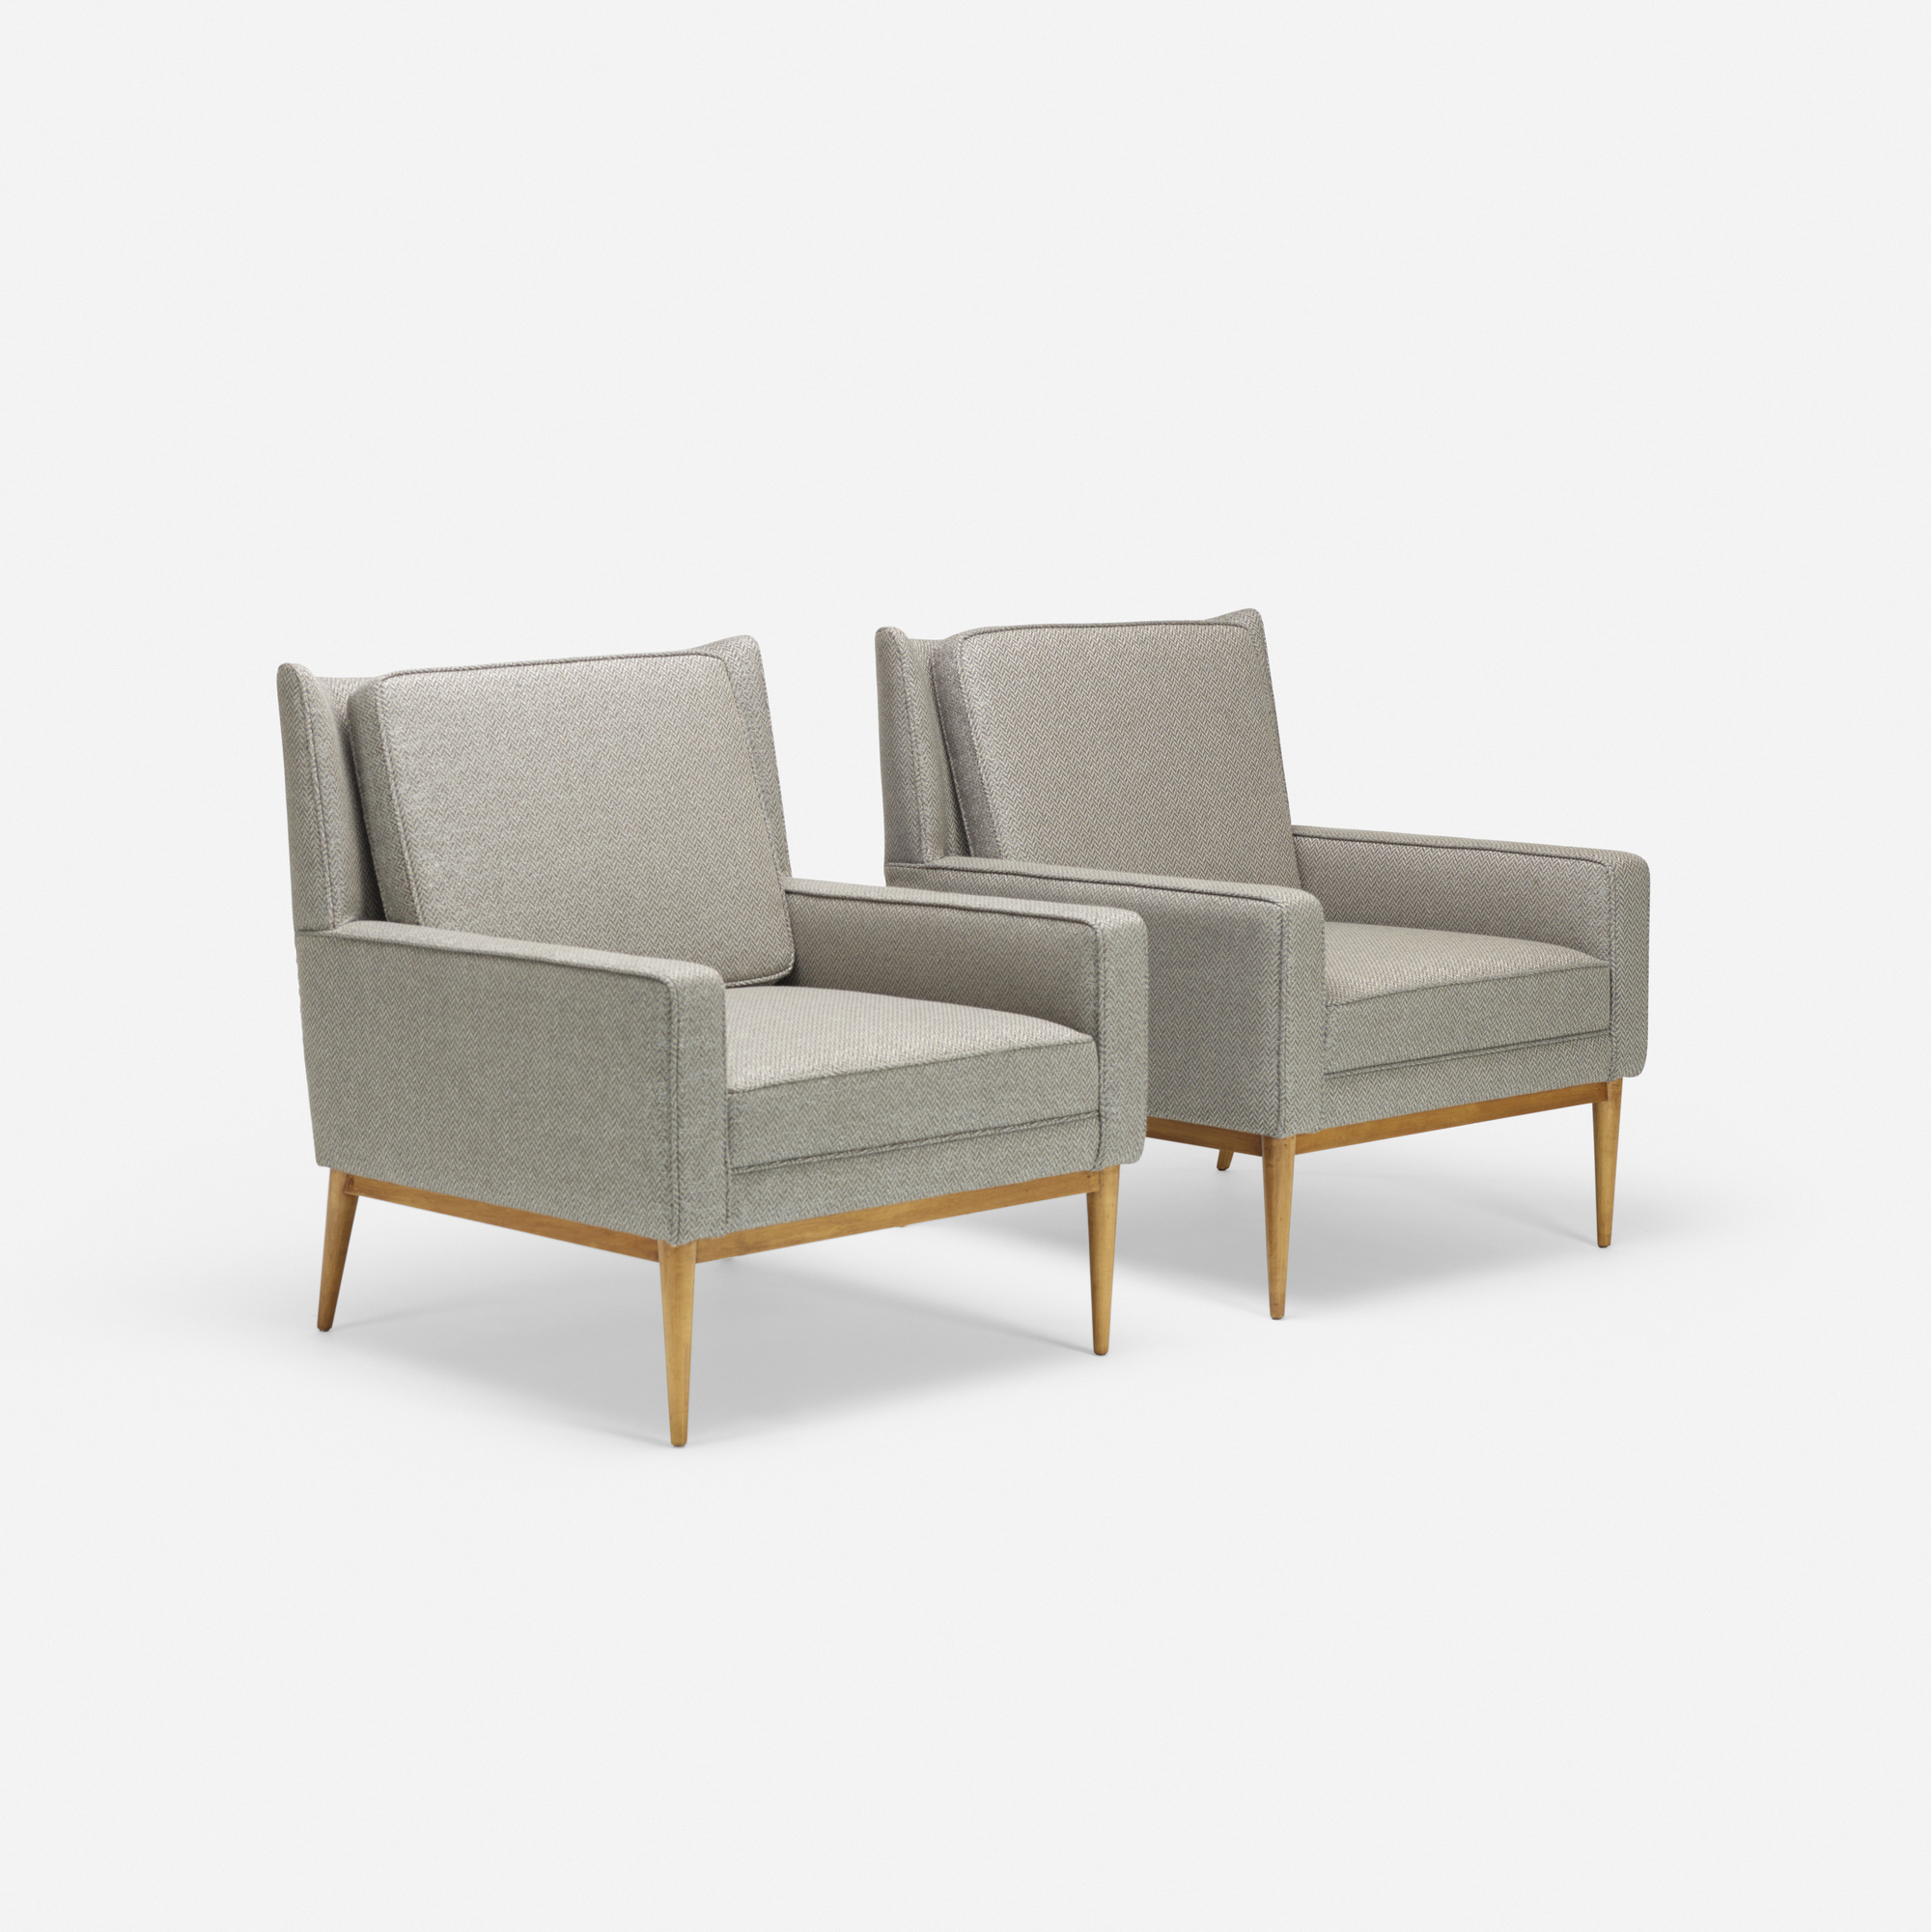 348: Paul McCobb / lounge chairs model 302, pair (2 of 3)